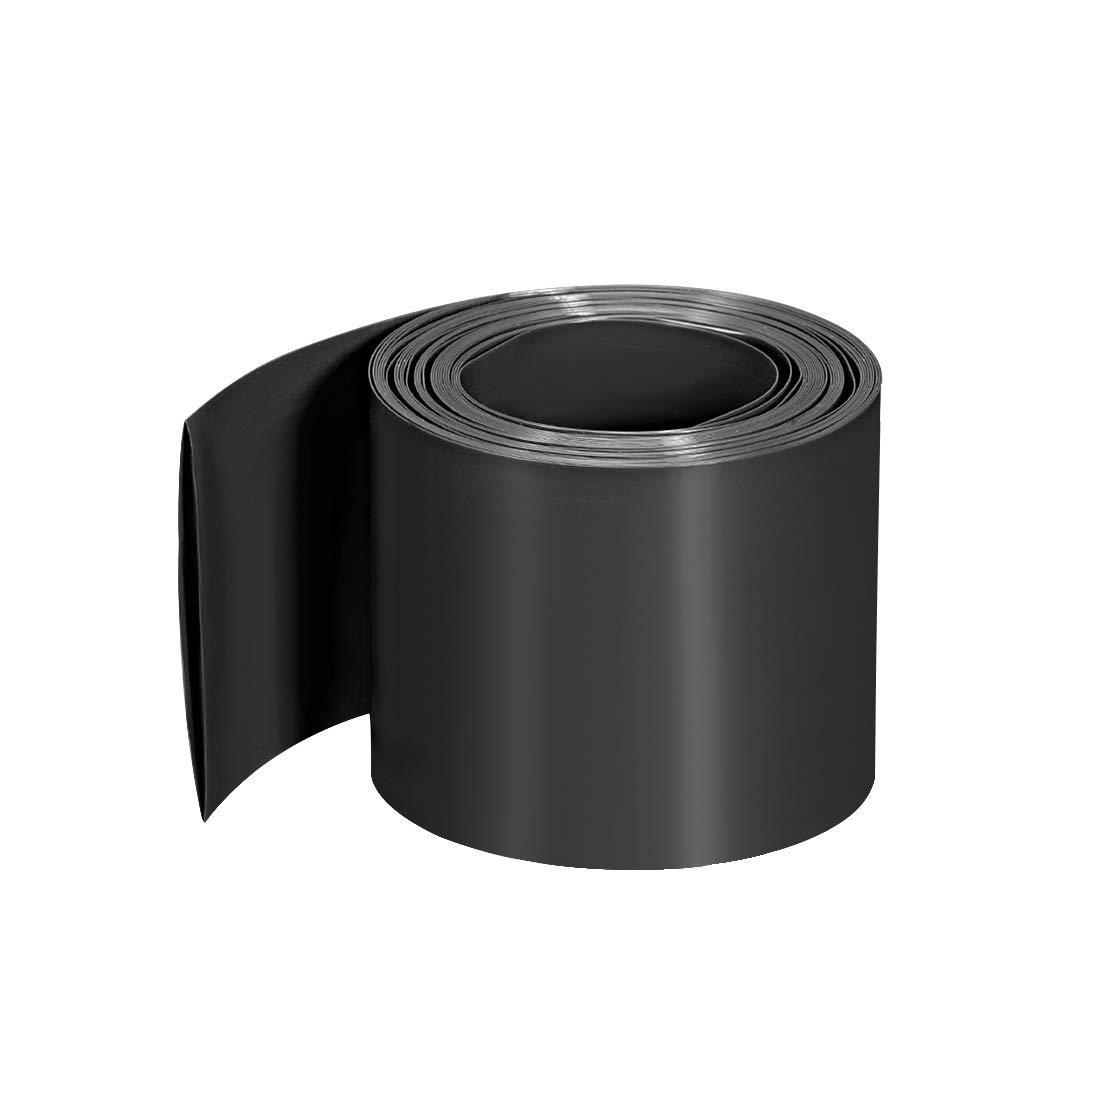 uxcell PVC Heat Shrink Tubing 60mm Flat Width Pre Cut Heat Shrink Wrap Tube for Three 18650 2m Length Black